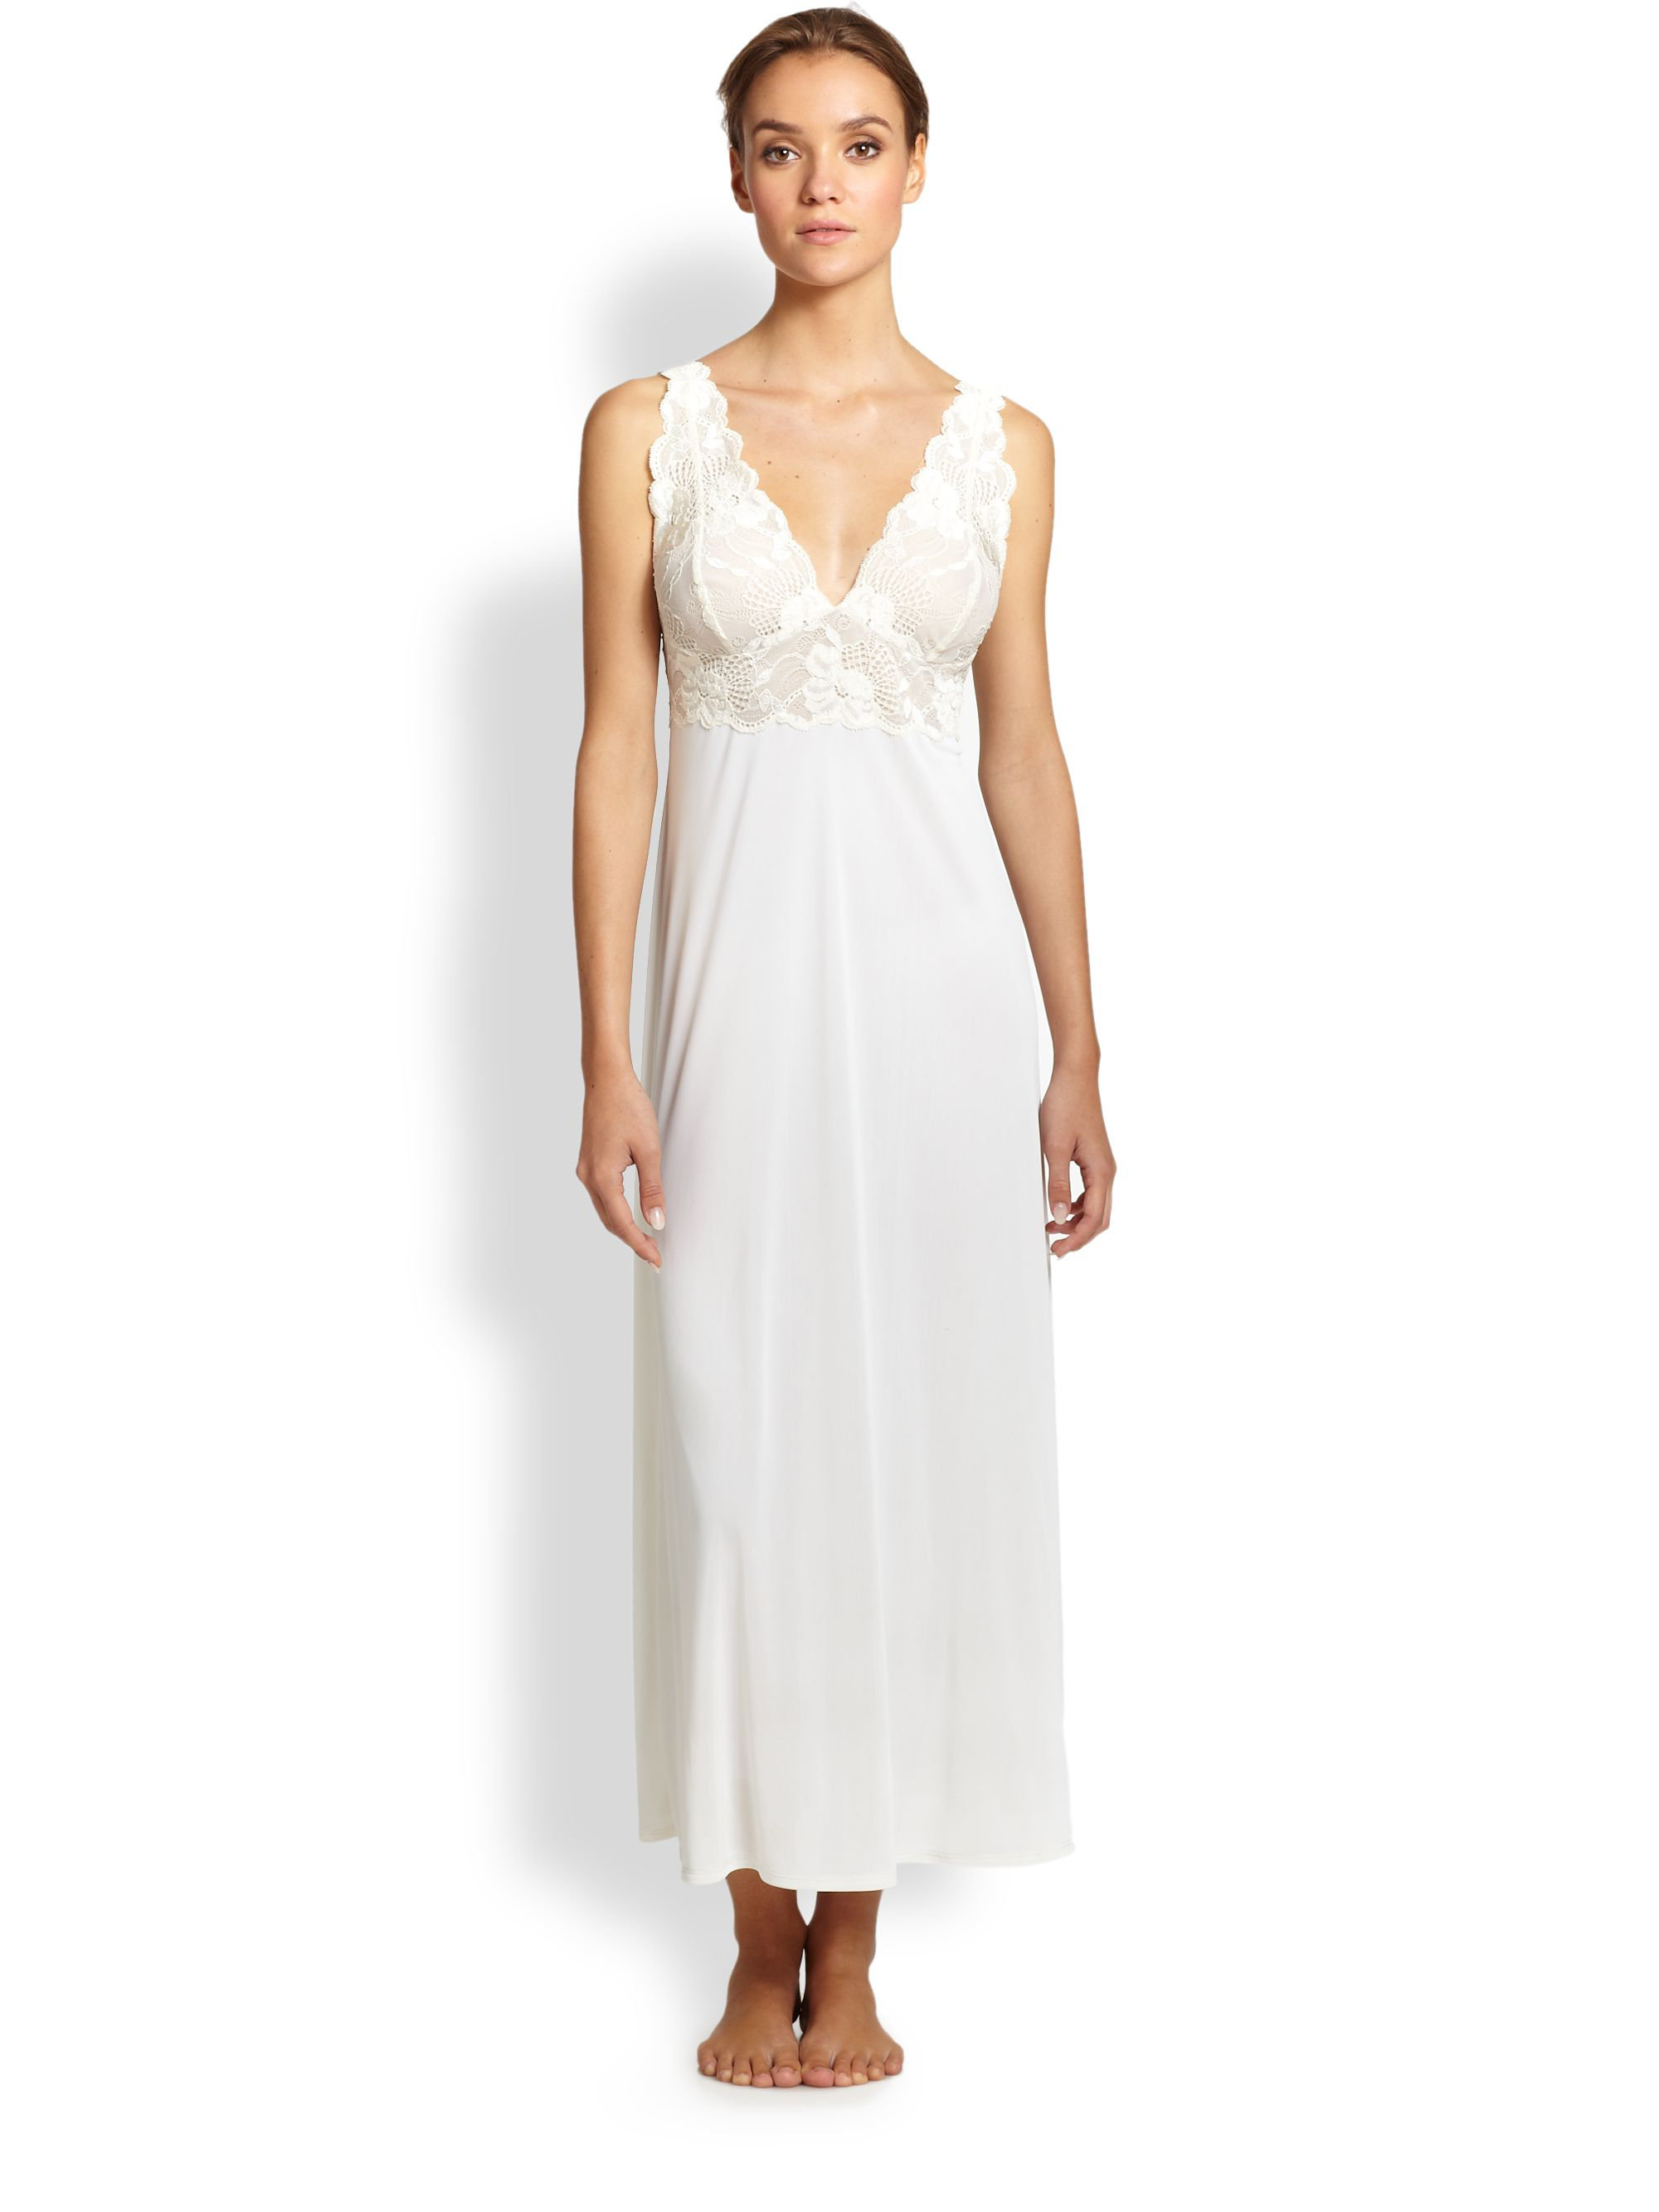 Lyst - Natori Zen Floral Lace-trim Gown in White